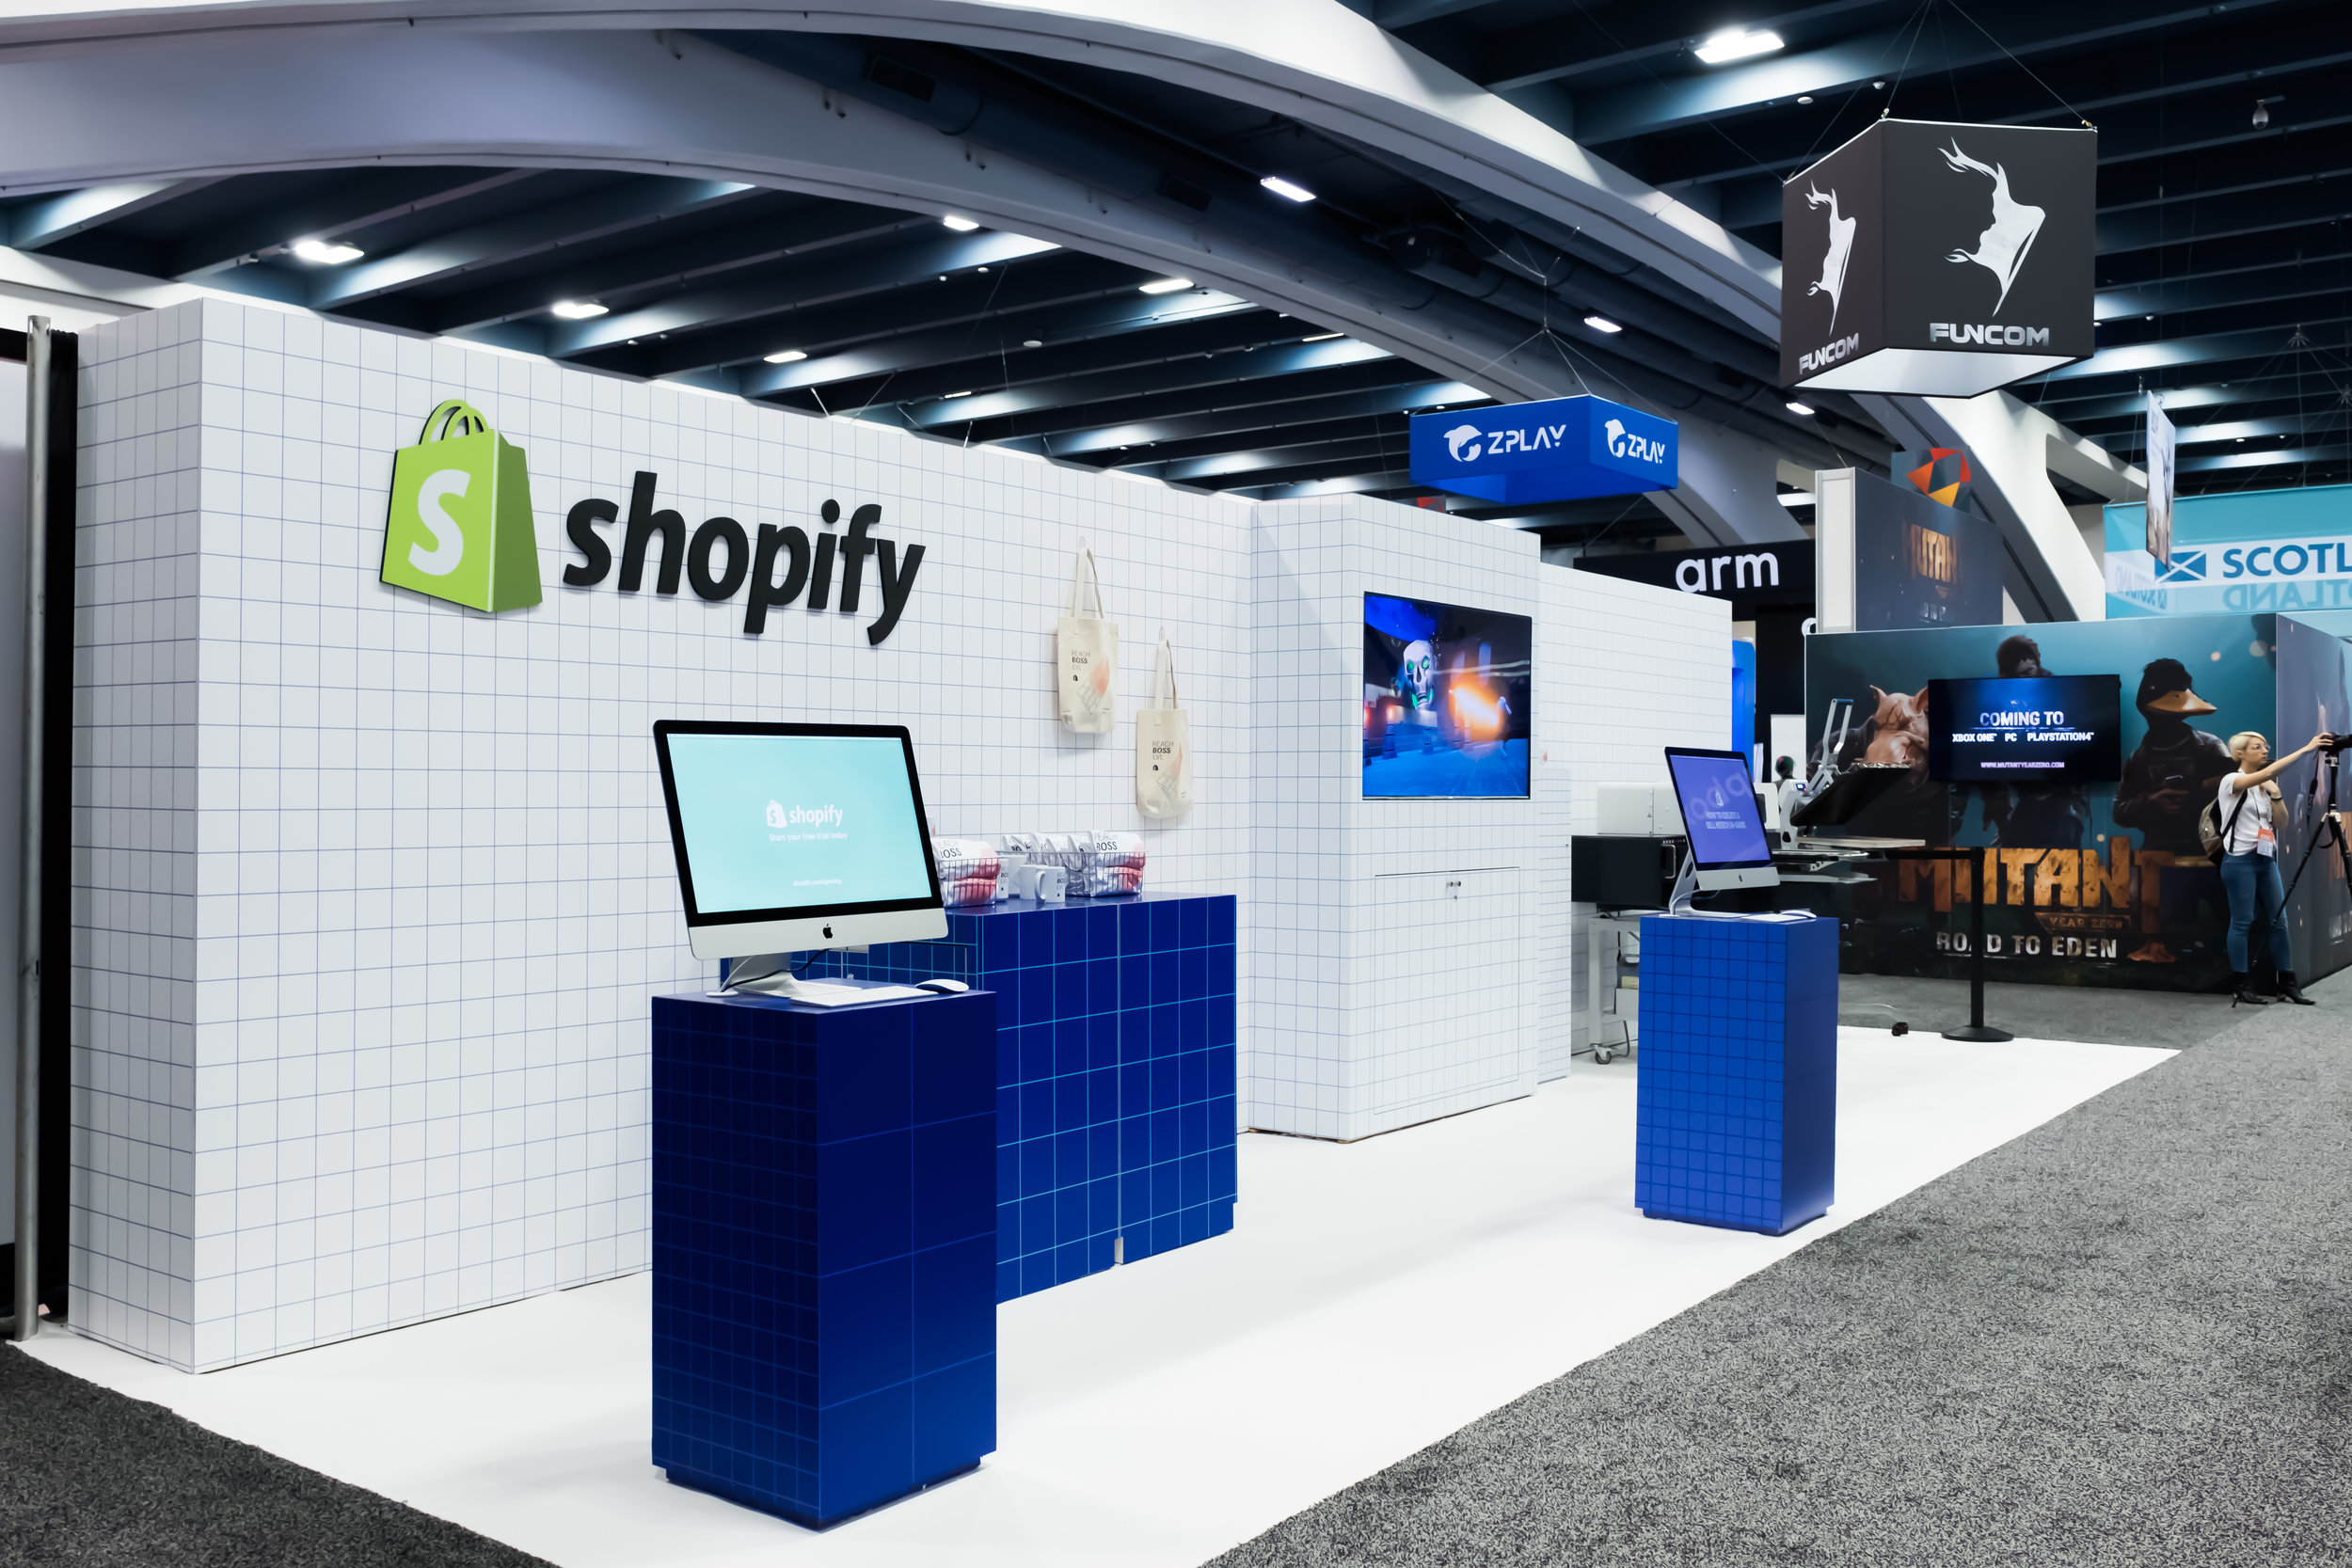 shopifyGDC18-3.jpg